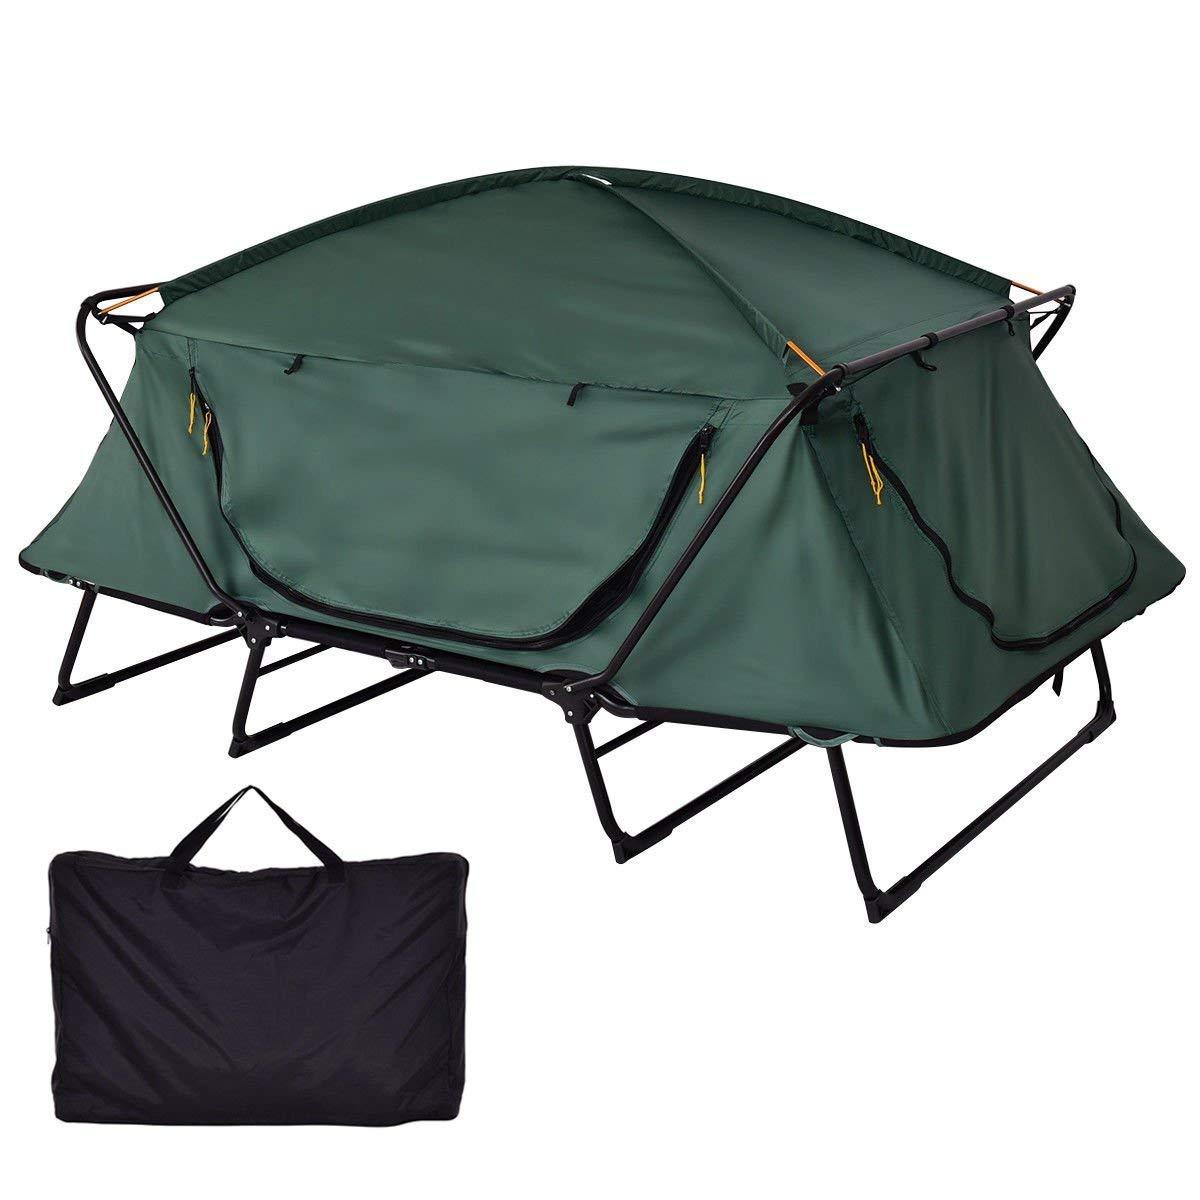 Tangkula Tent Cot Folding Waterproof 2 Person Hiking